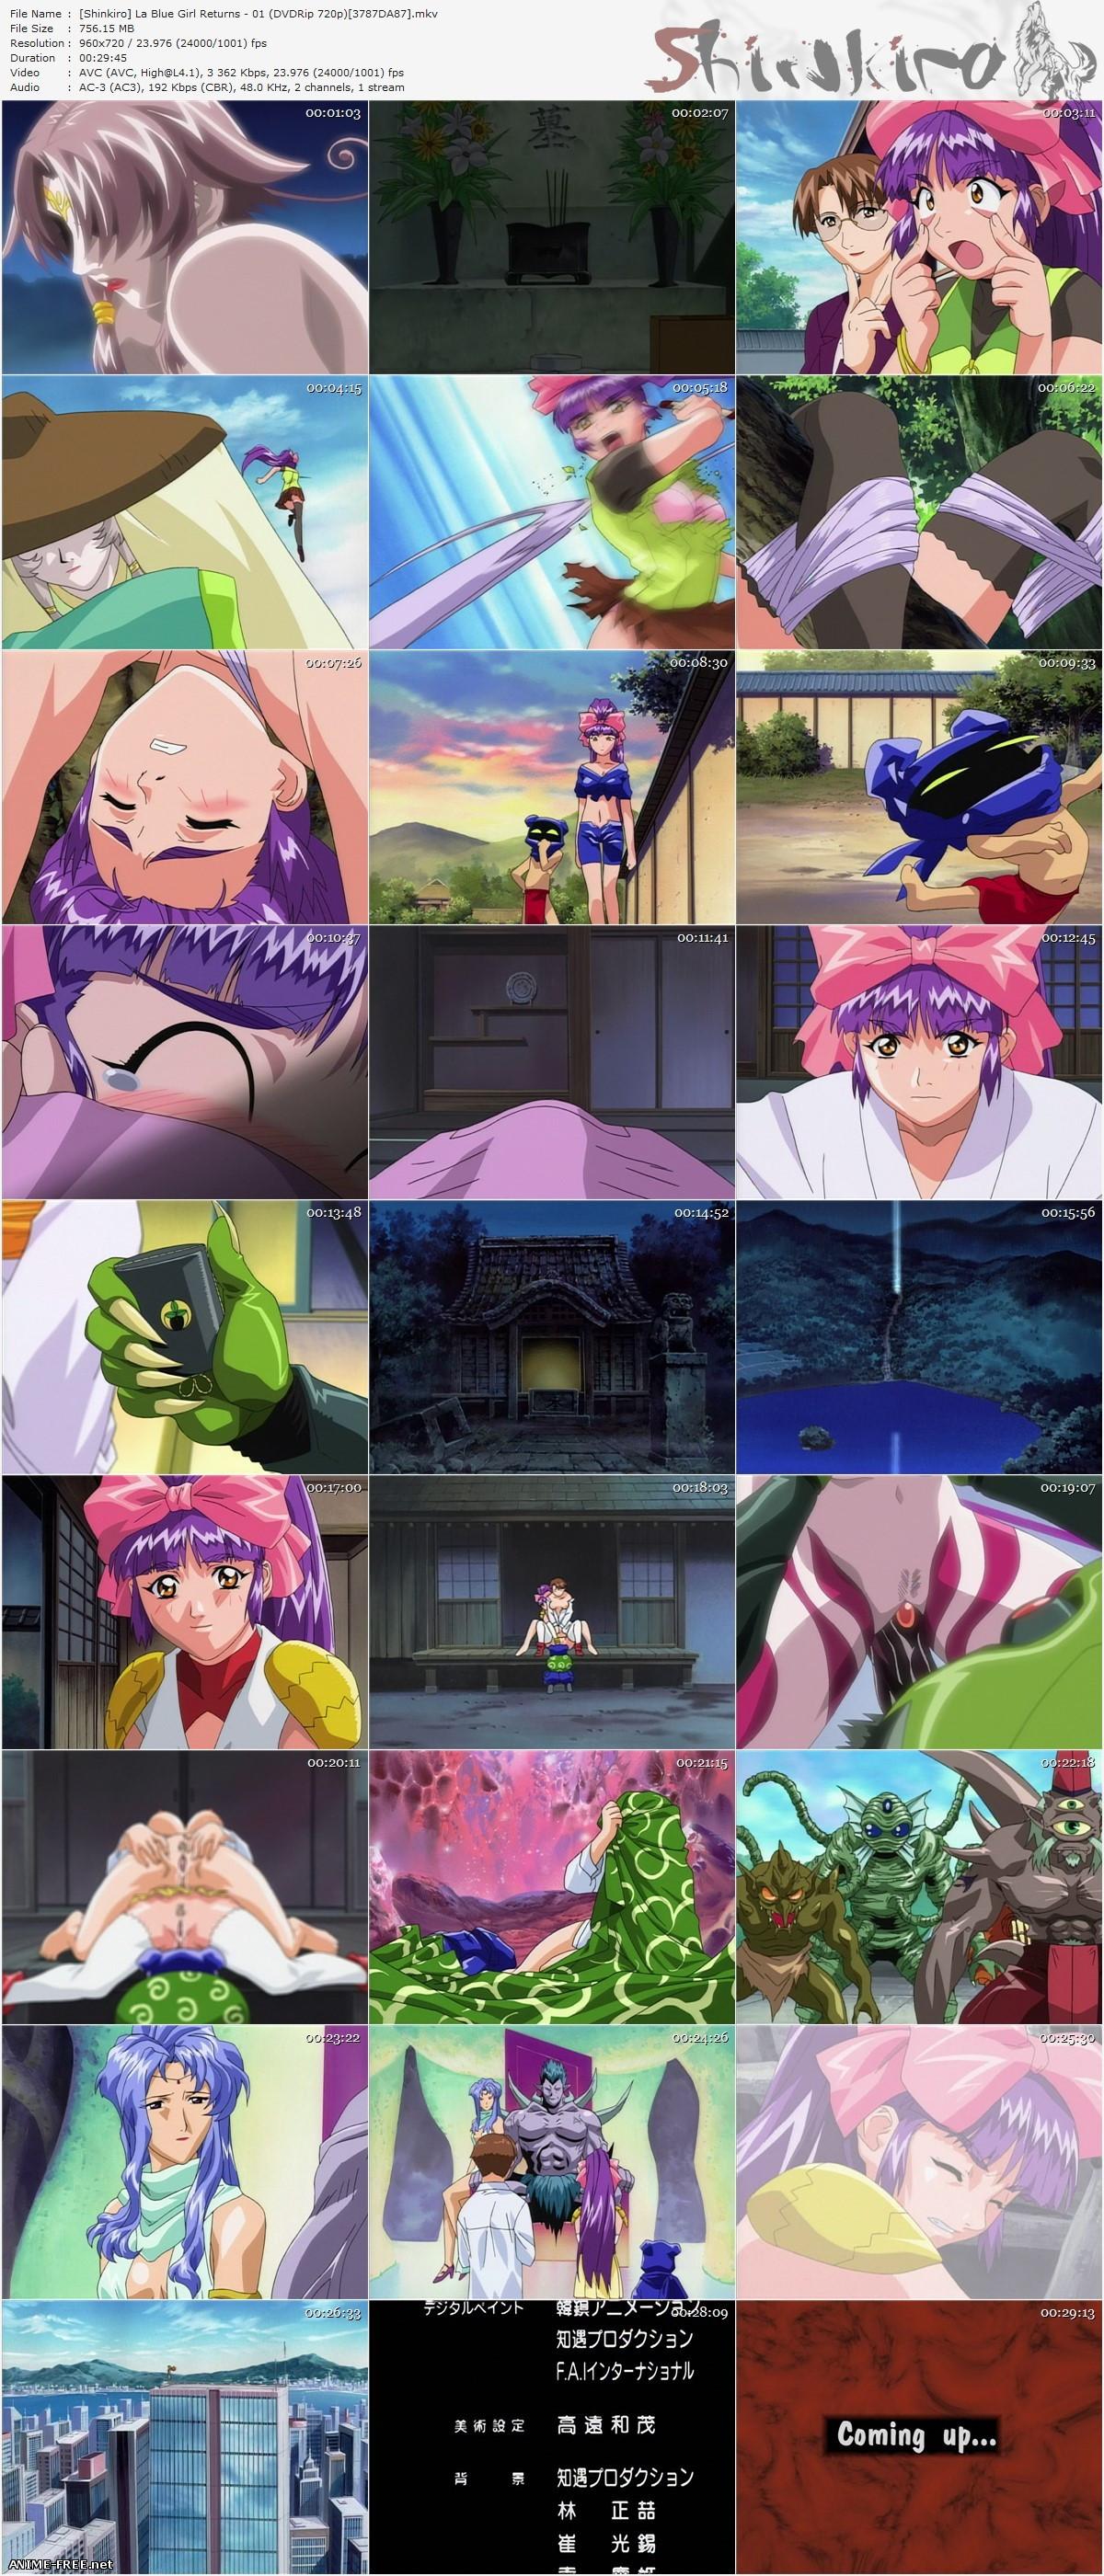 La Blue Girl Returns / Inju Gakuen Fukkatsu / La Blue Girl Returns: Demon Seed / Синяя девочка возвращается [Ep.1-4] [RUS,ENG,JAP] [720p] Anime Hentai